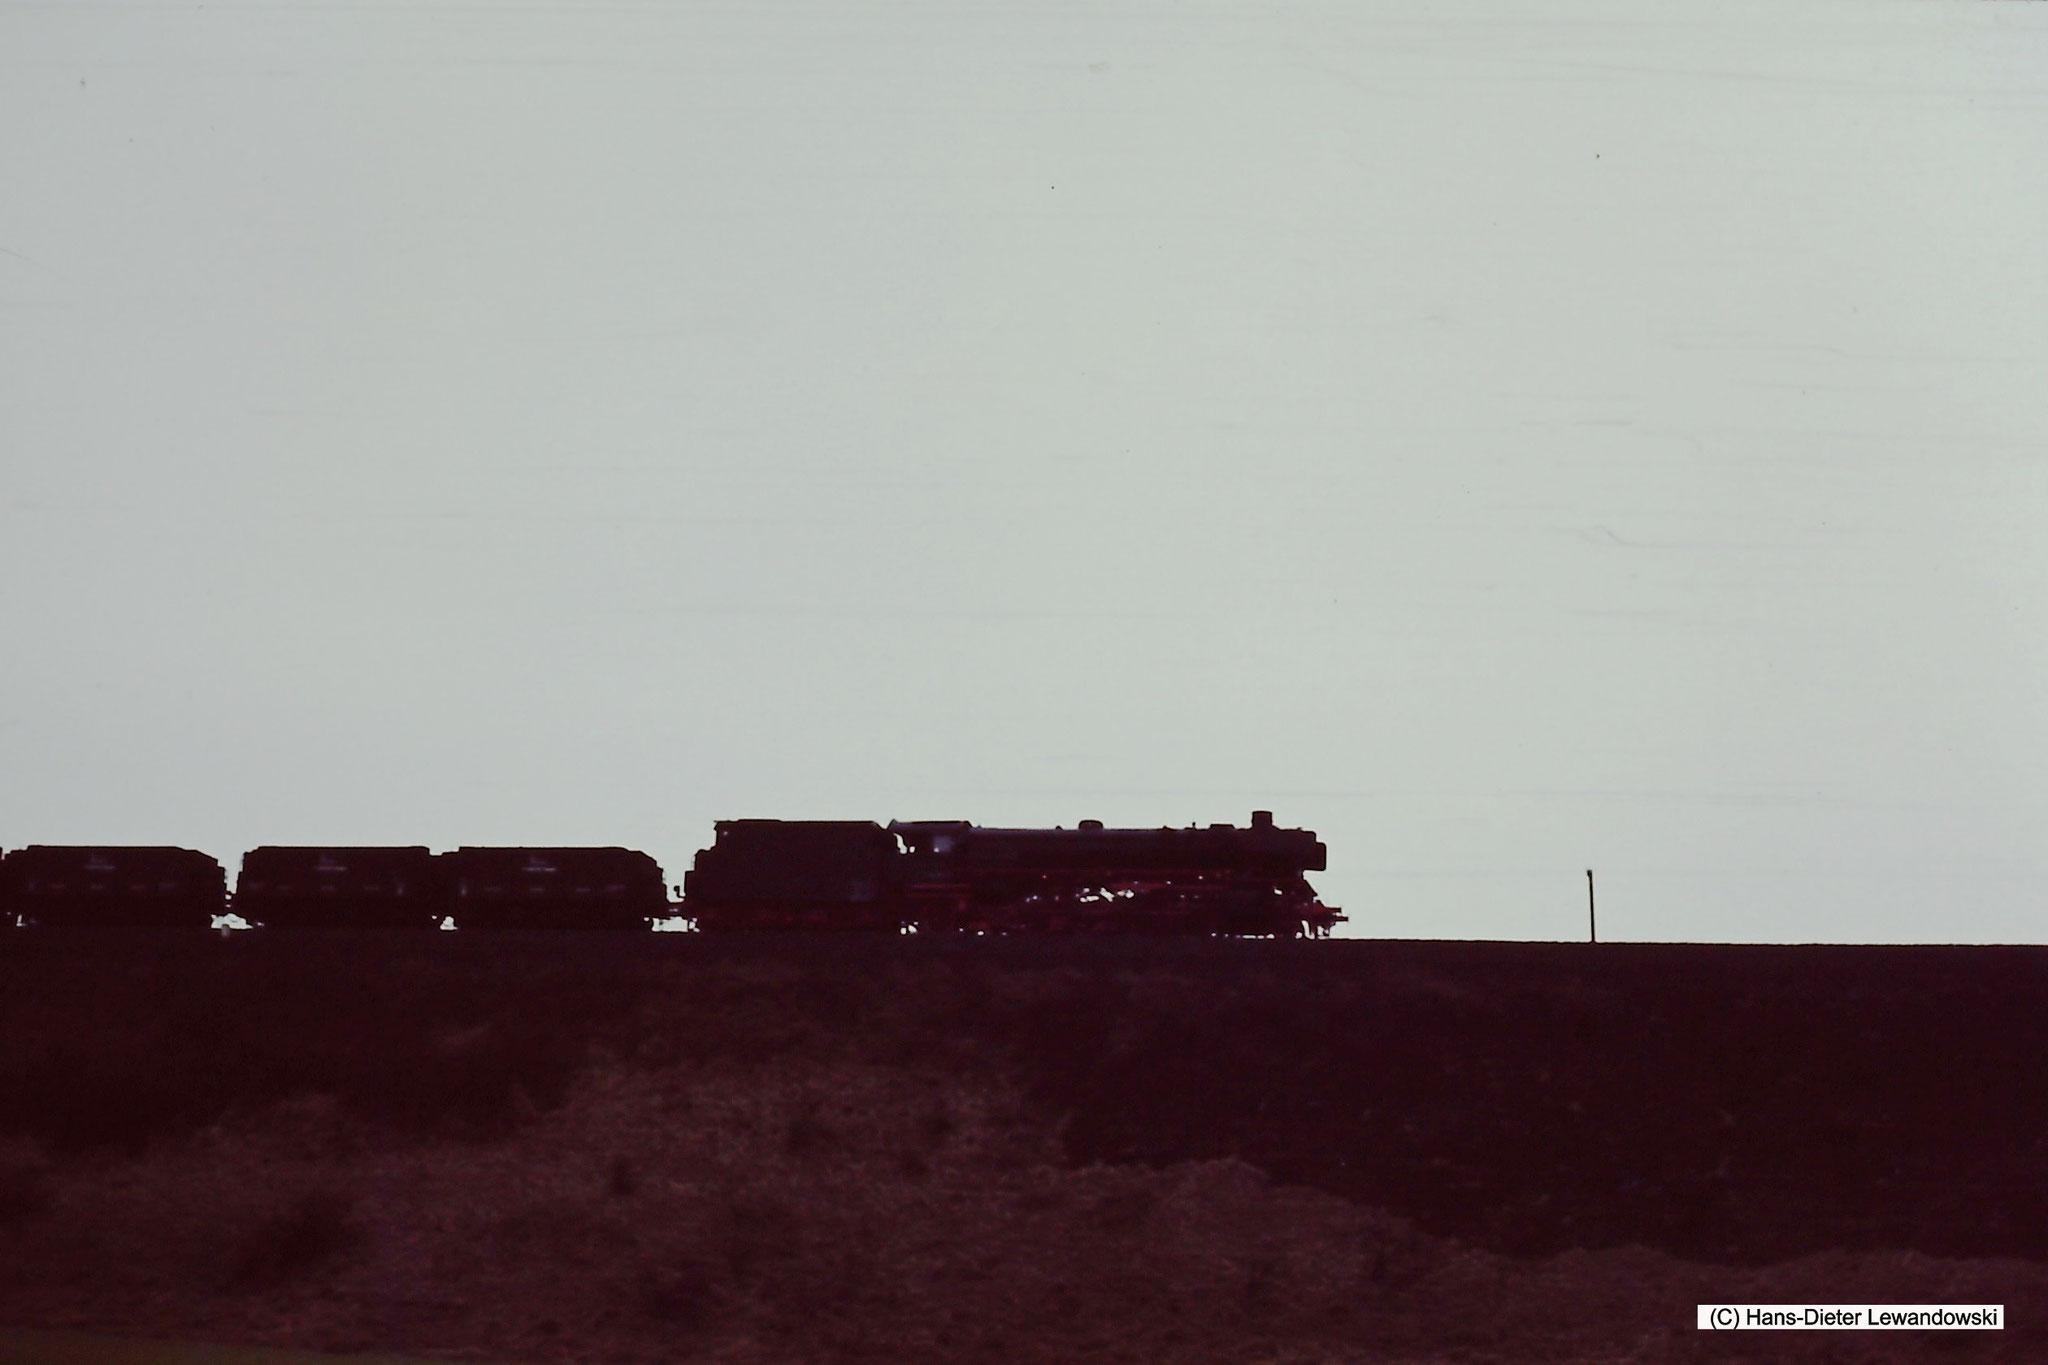 Auf dem Bahndamm bei Lutter am Barenberge